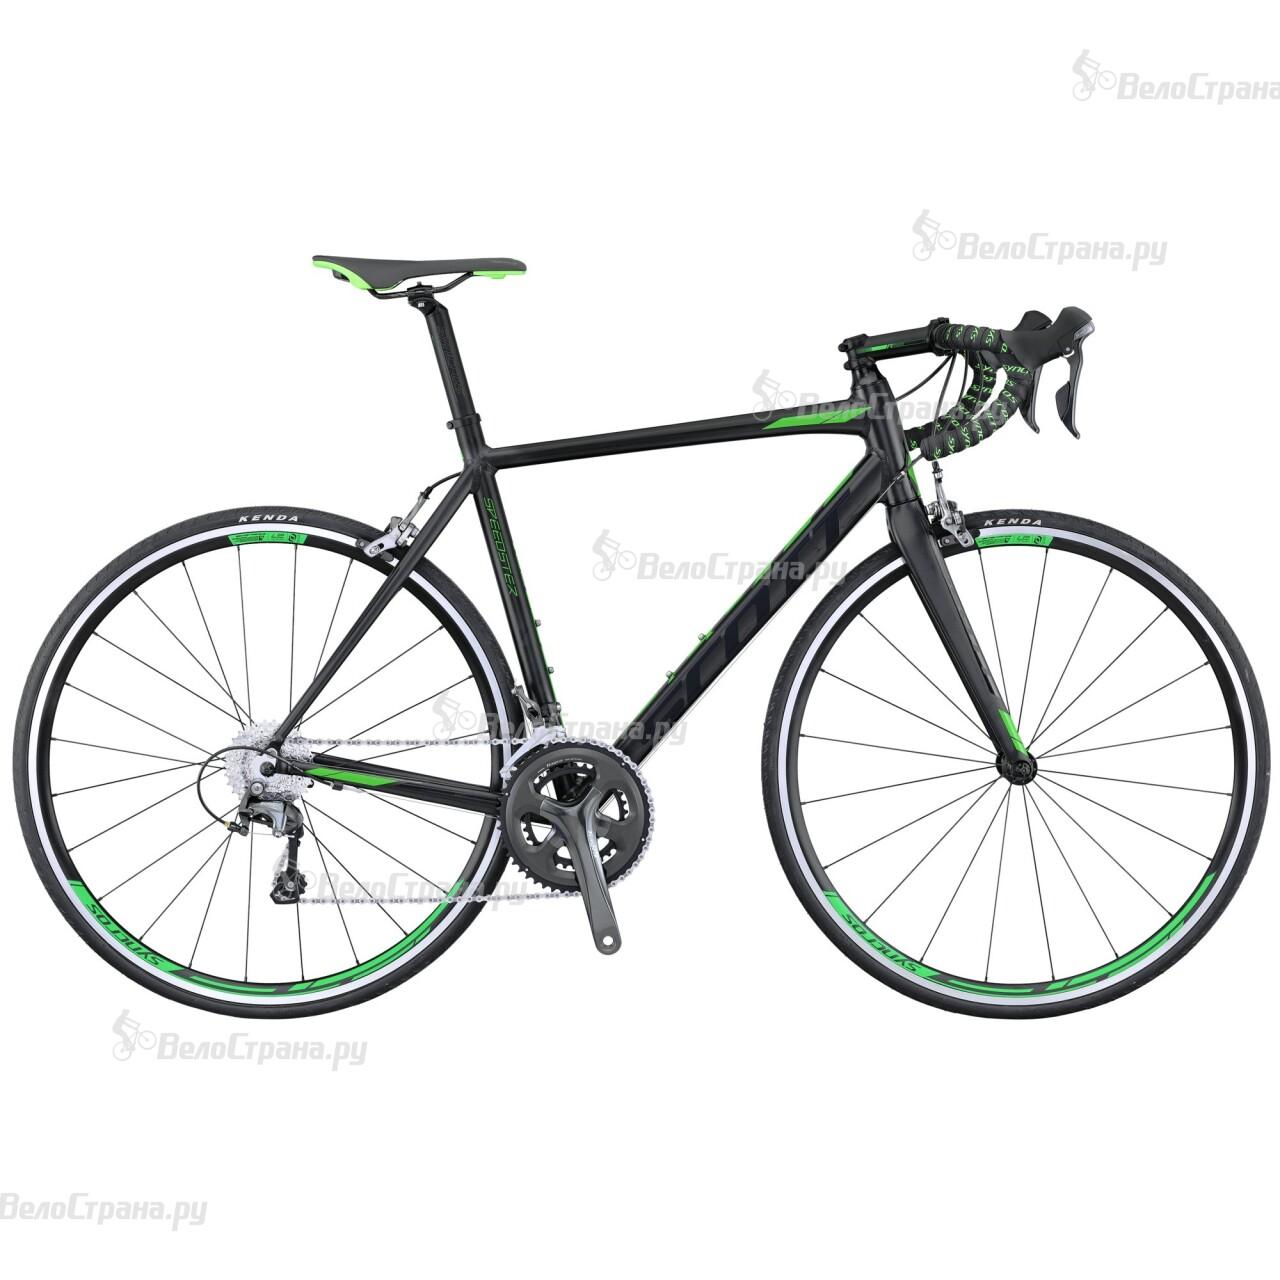 Велосипед Scott Speedster 30 Compact (2016) велосипед scott contessa solace 15 compact 2015